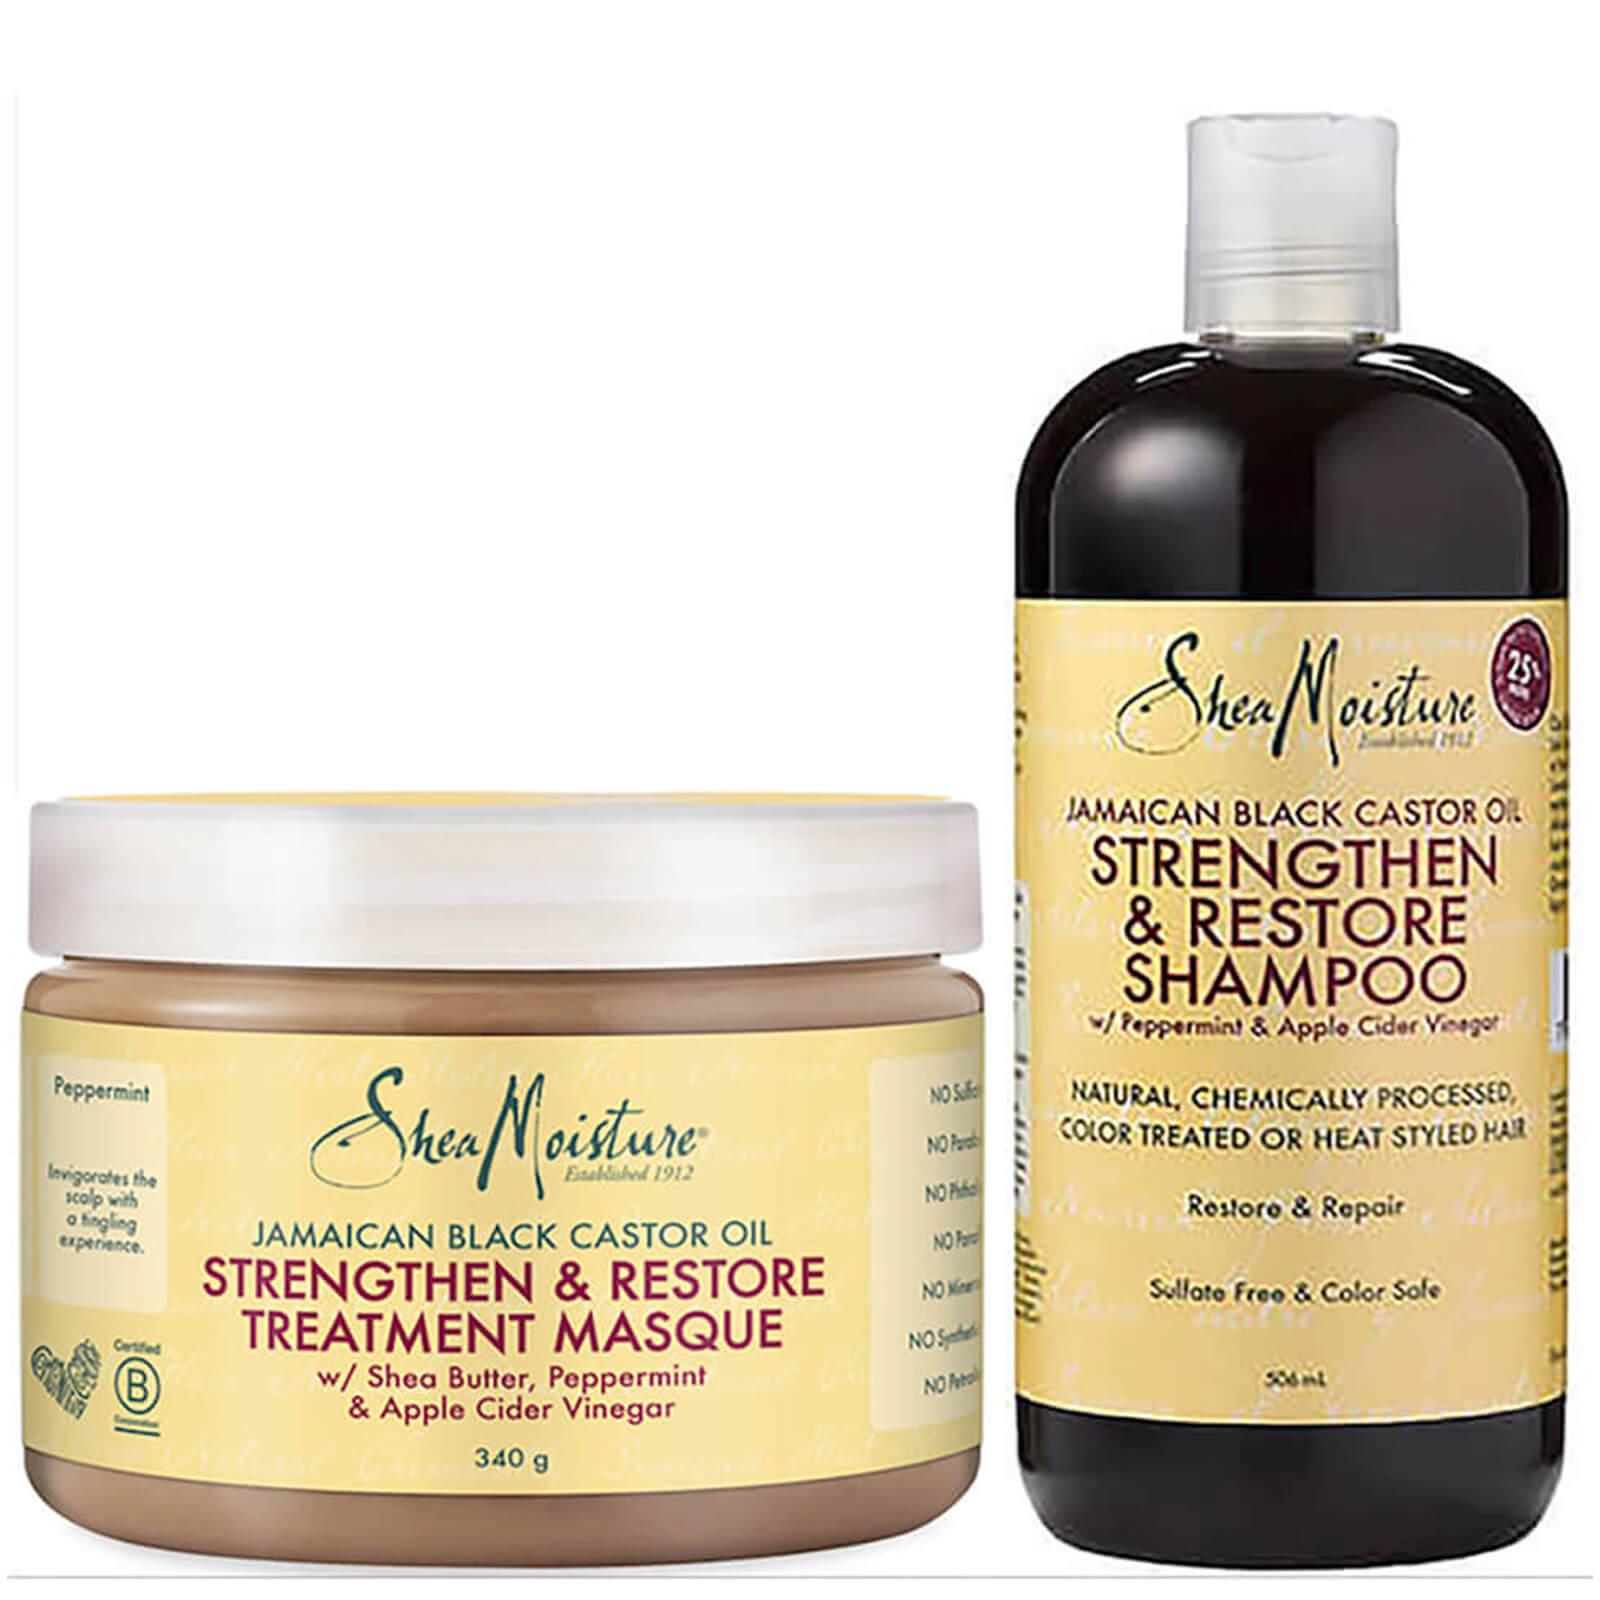 shea moisture jamaican black castor oil duo (worth £25.98)